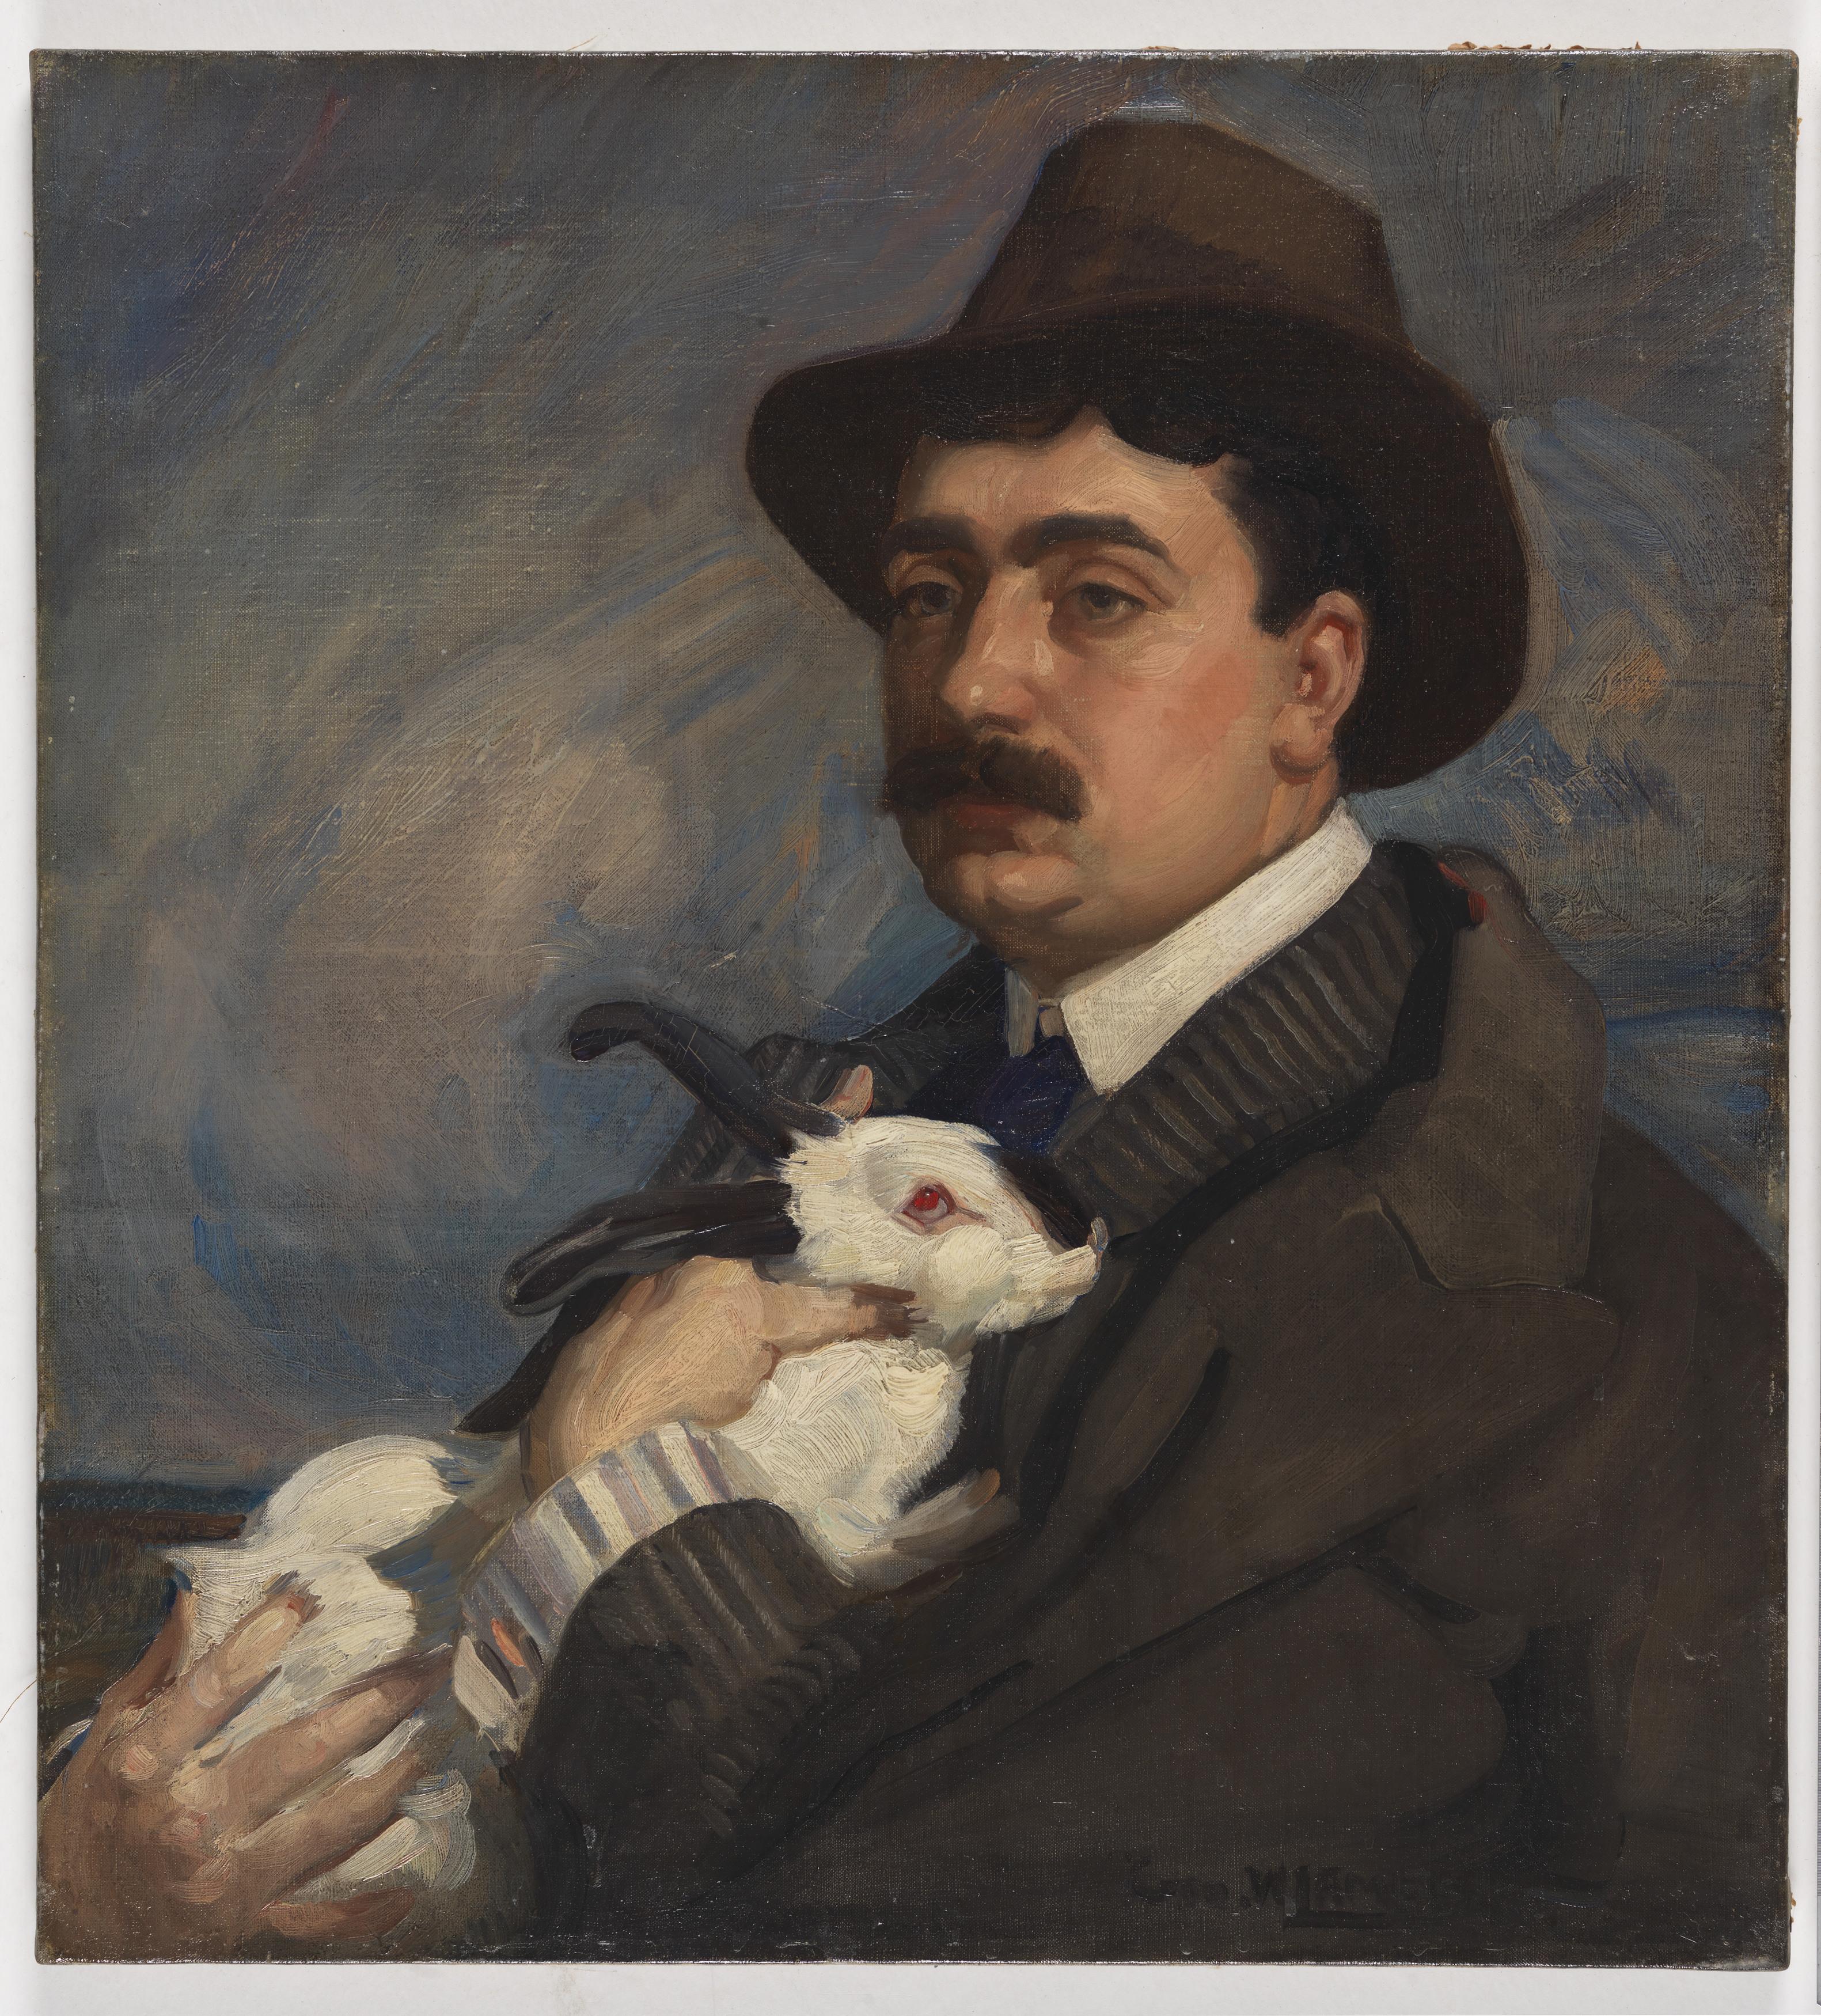 Man with rabbit, ca. 1910 / by George Washington Lambert